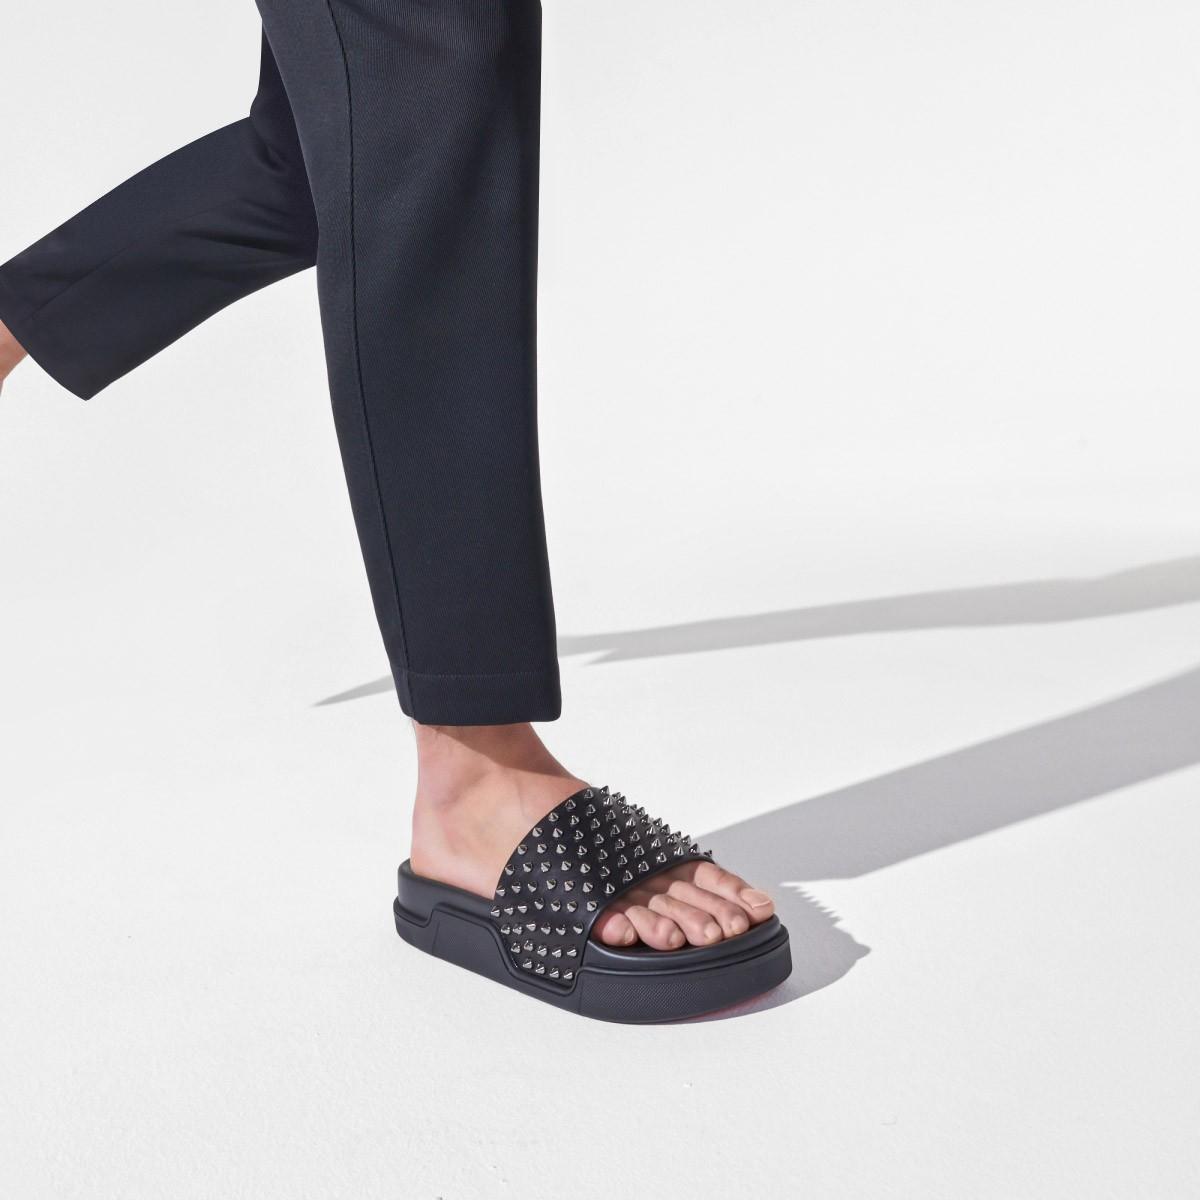 Men Shoes - Pool Fun - Christian Louboutin